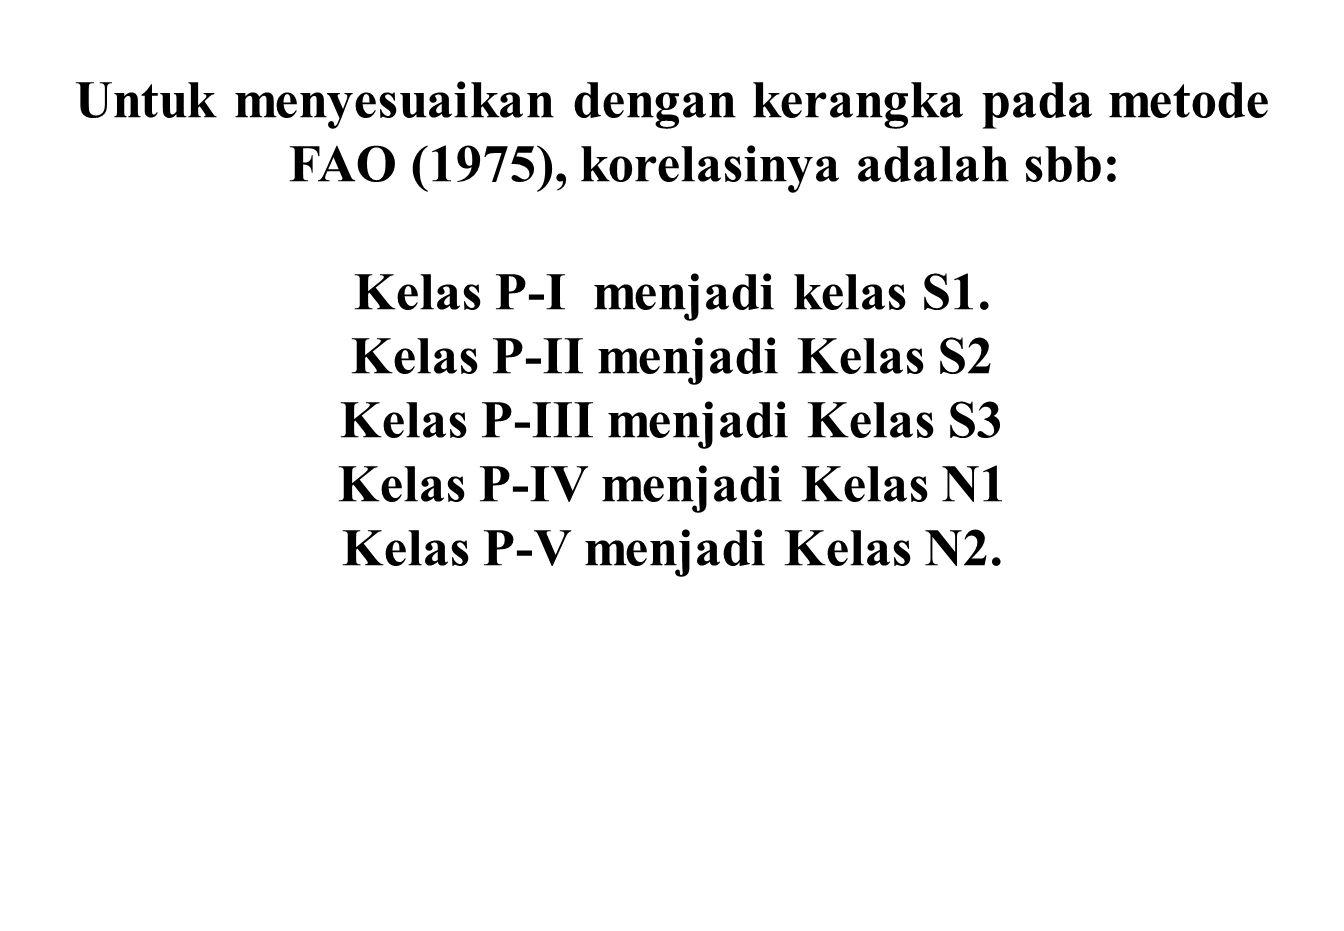 Untuk menyesuaikan dengan kerangka pada metode FAO (1975), korelasinya adalah sbb: Kelas P-I menjadi kelas S1.